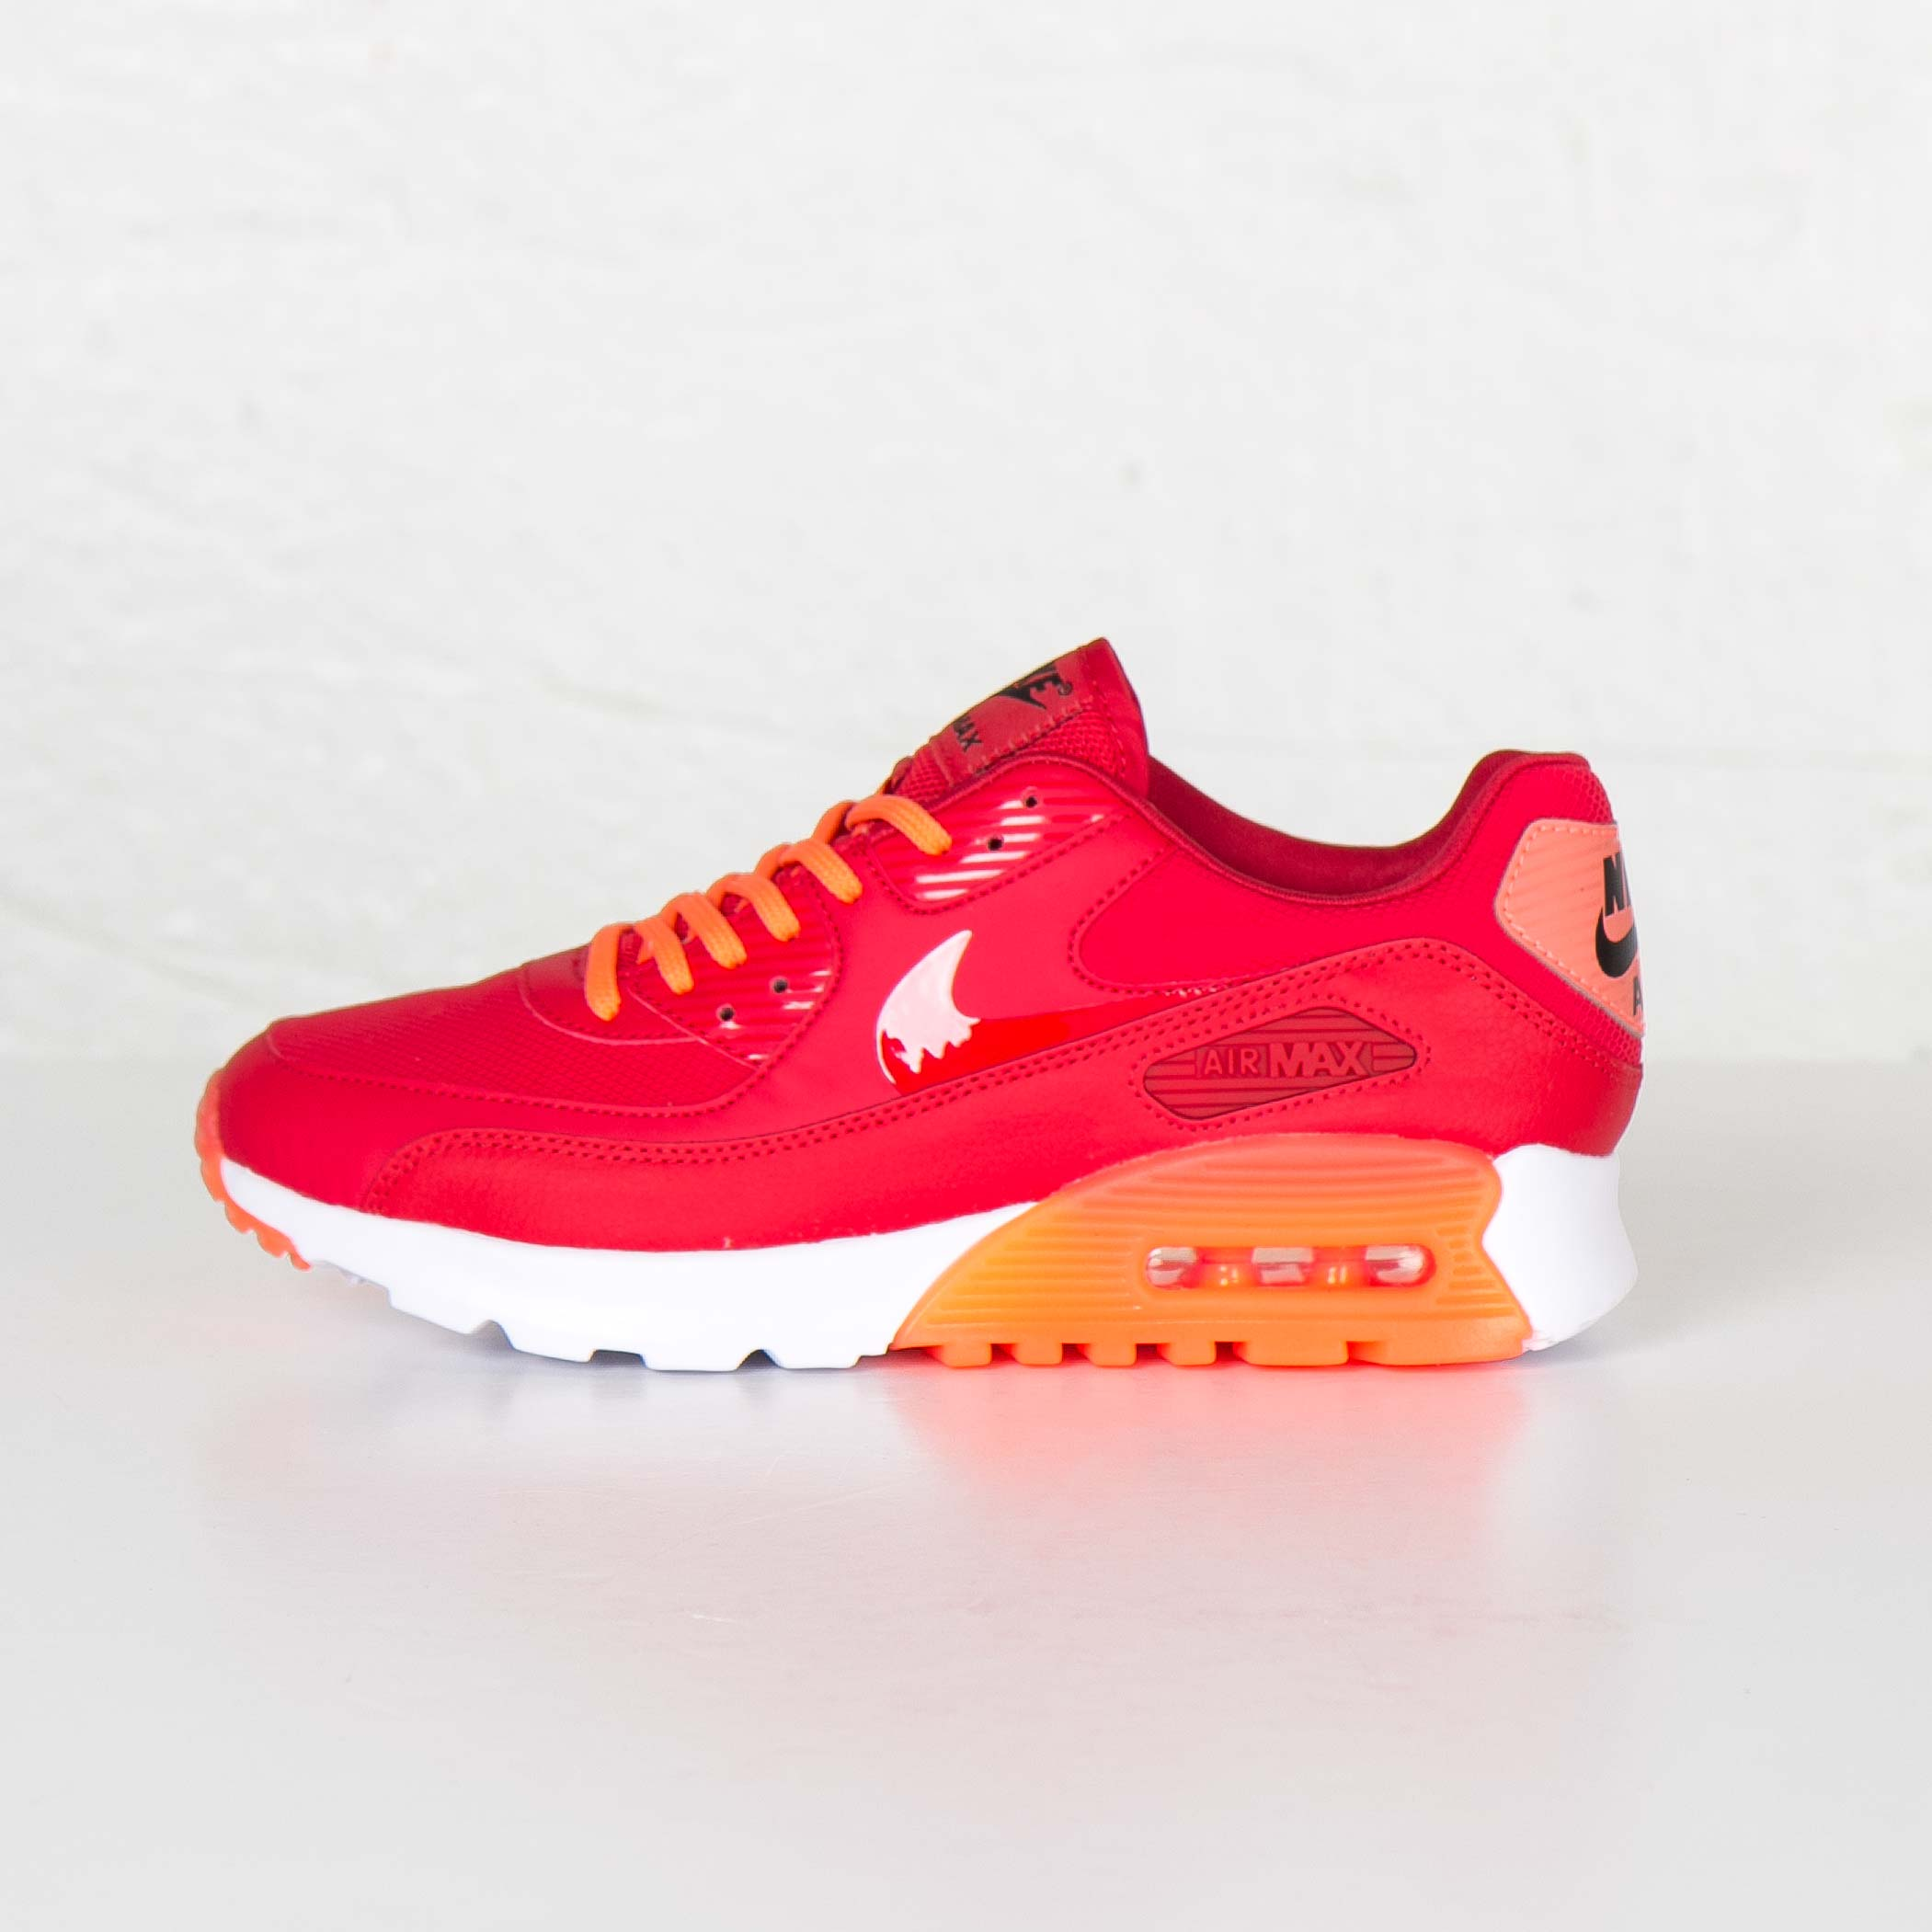 best authentic c6b59 18471 Nike W Air Max 90 Ultra Essential - 724981-602 - Sneakersnstuff   sneakers    streetwear online since 1999